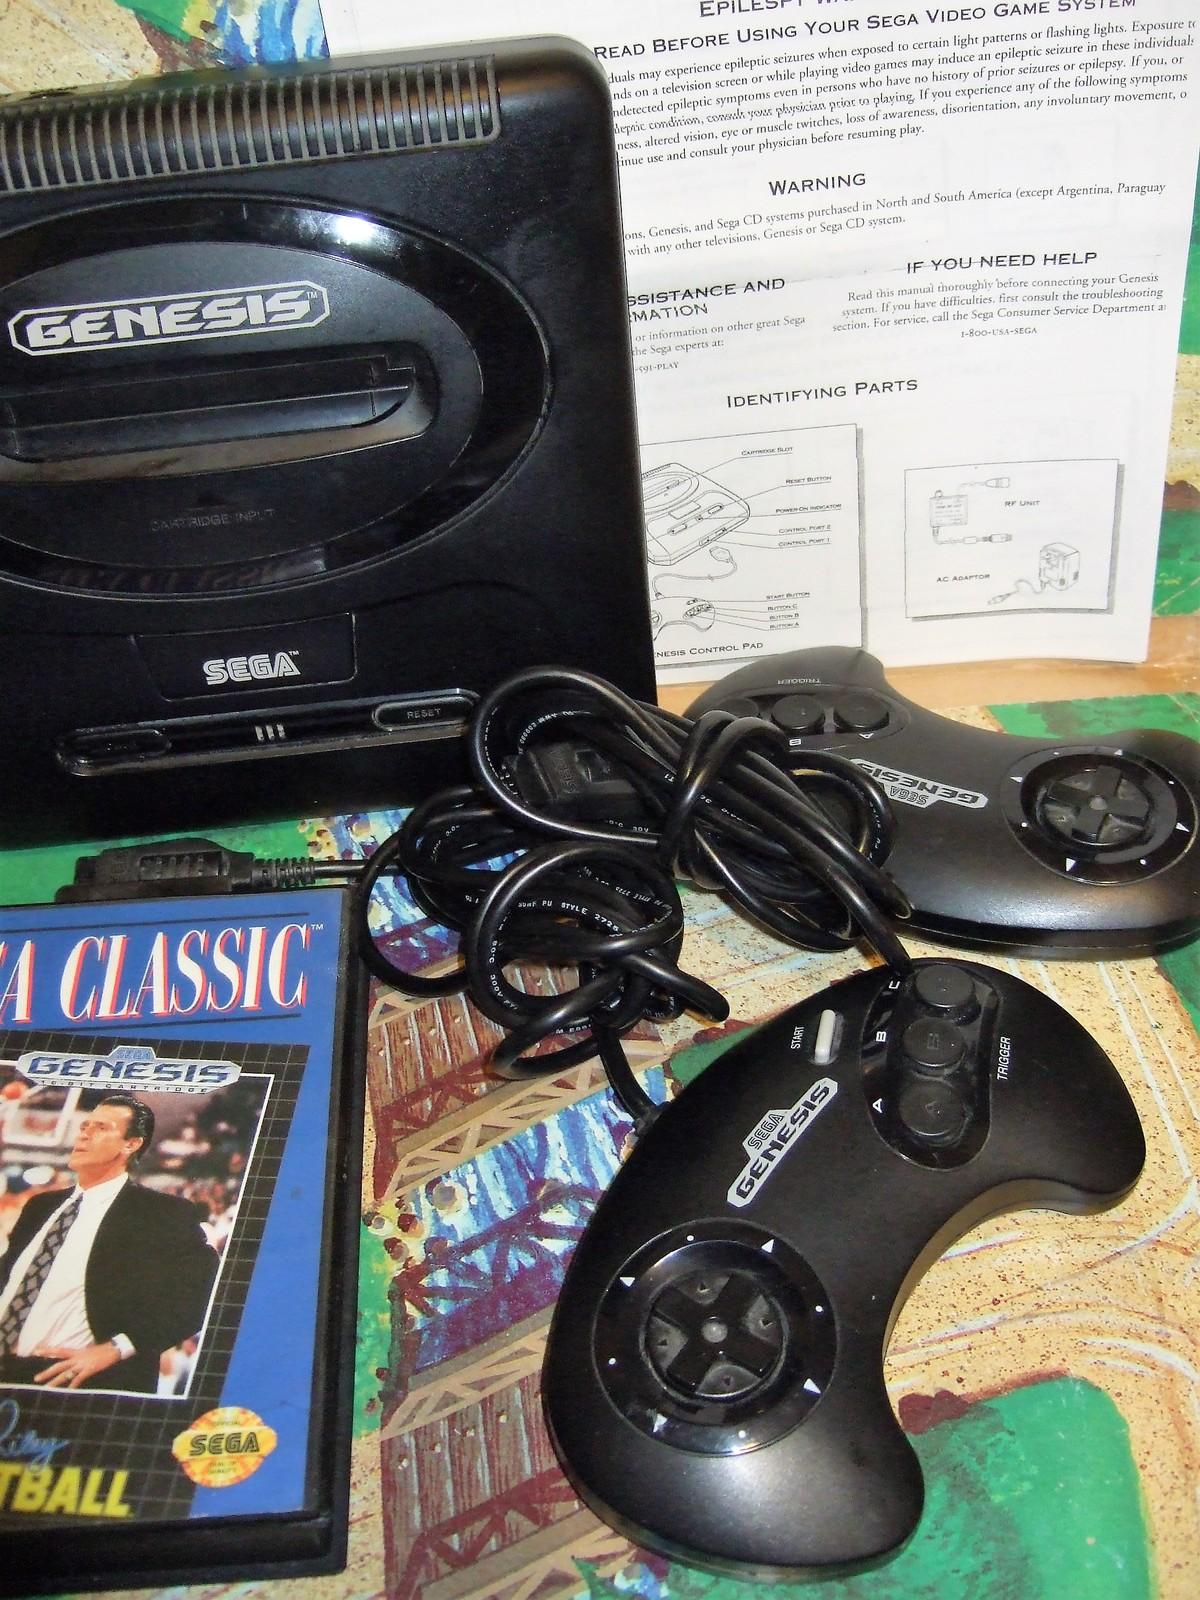 Sega Genesis Console System (Complete)